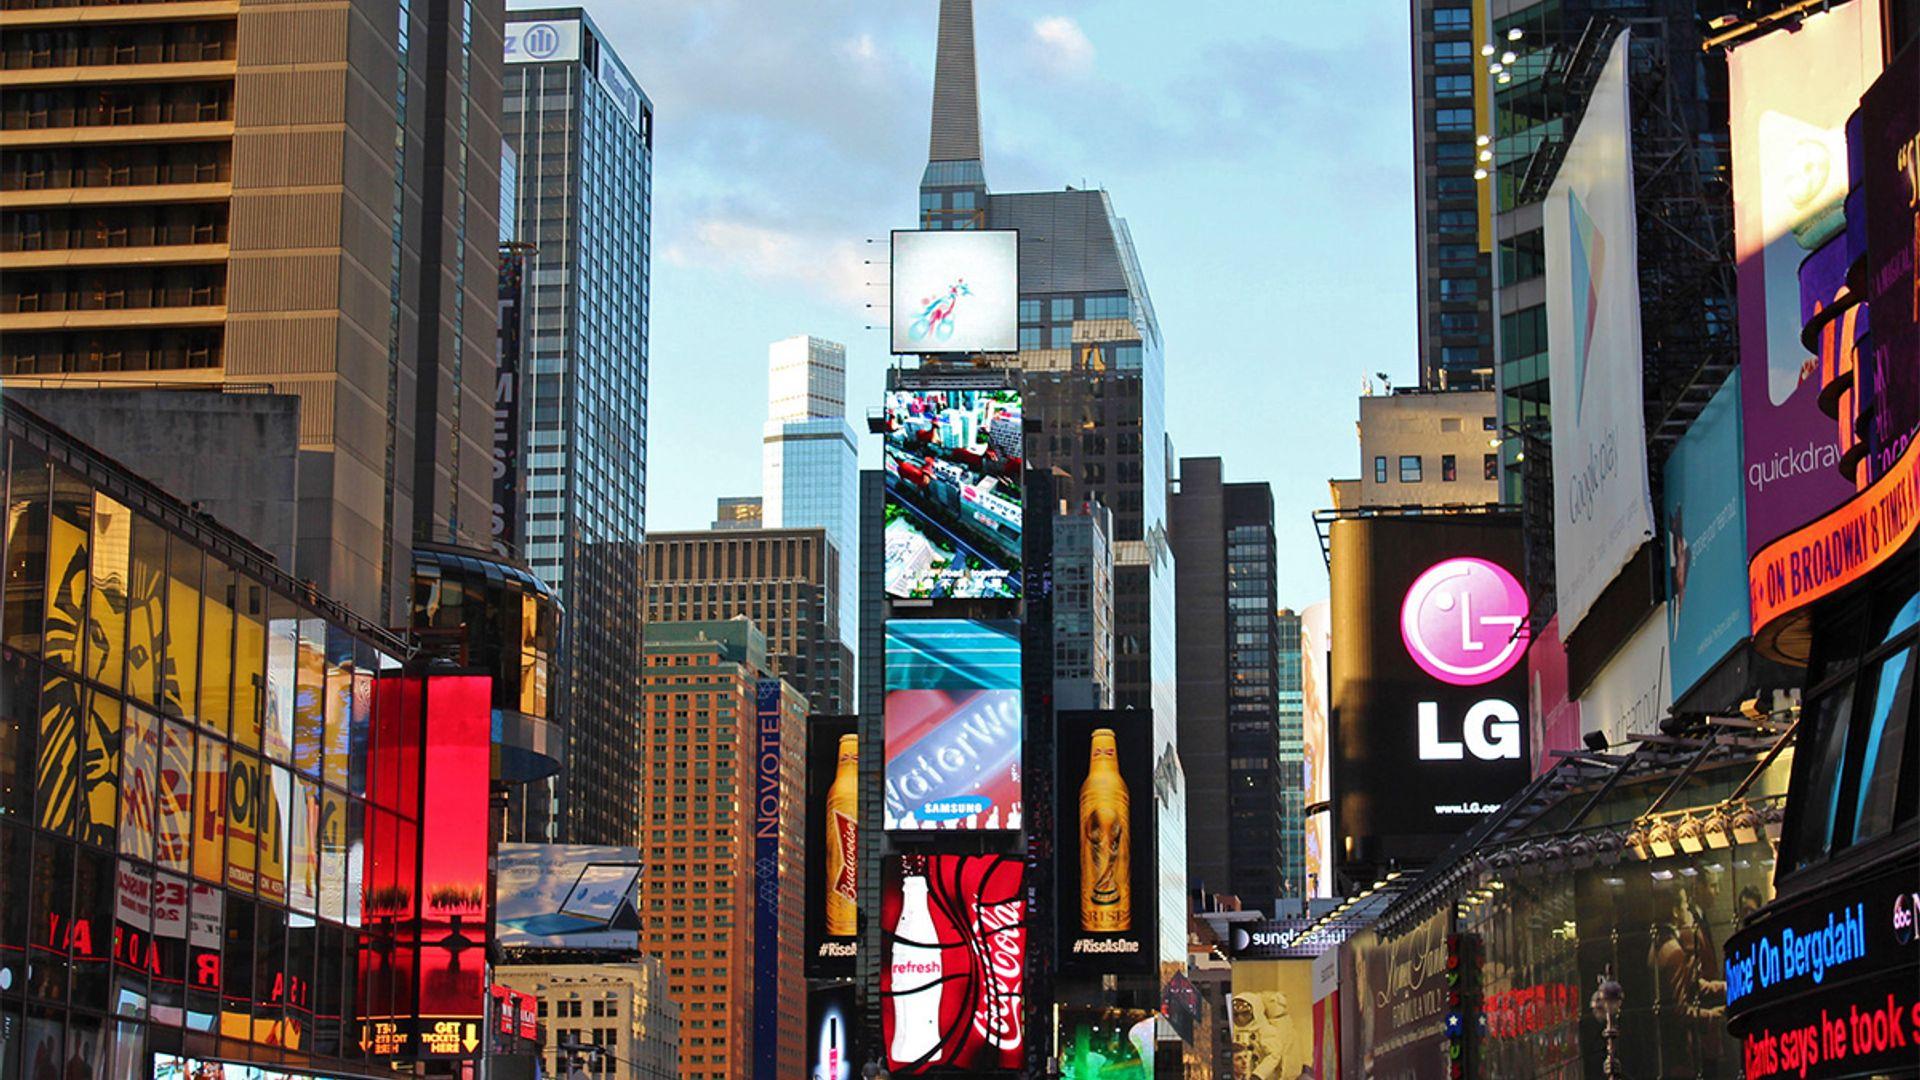 Revelion 2022 - Circuit de grup - Explore SUA Est - New York & Miami, 10 zile